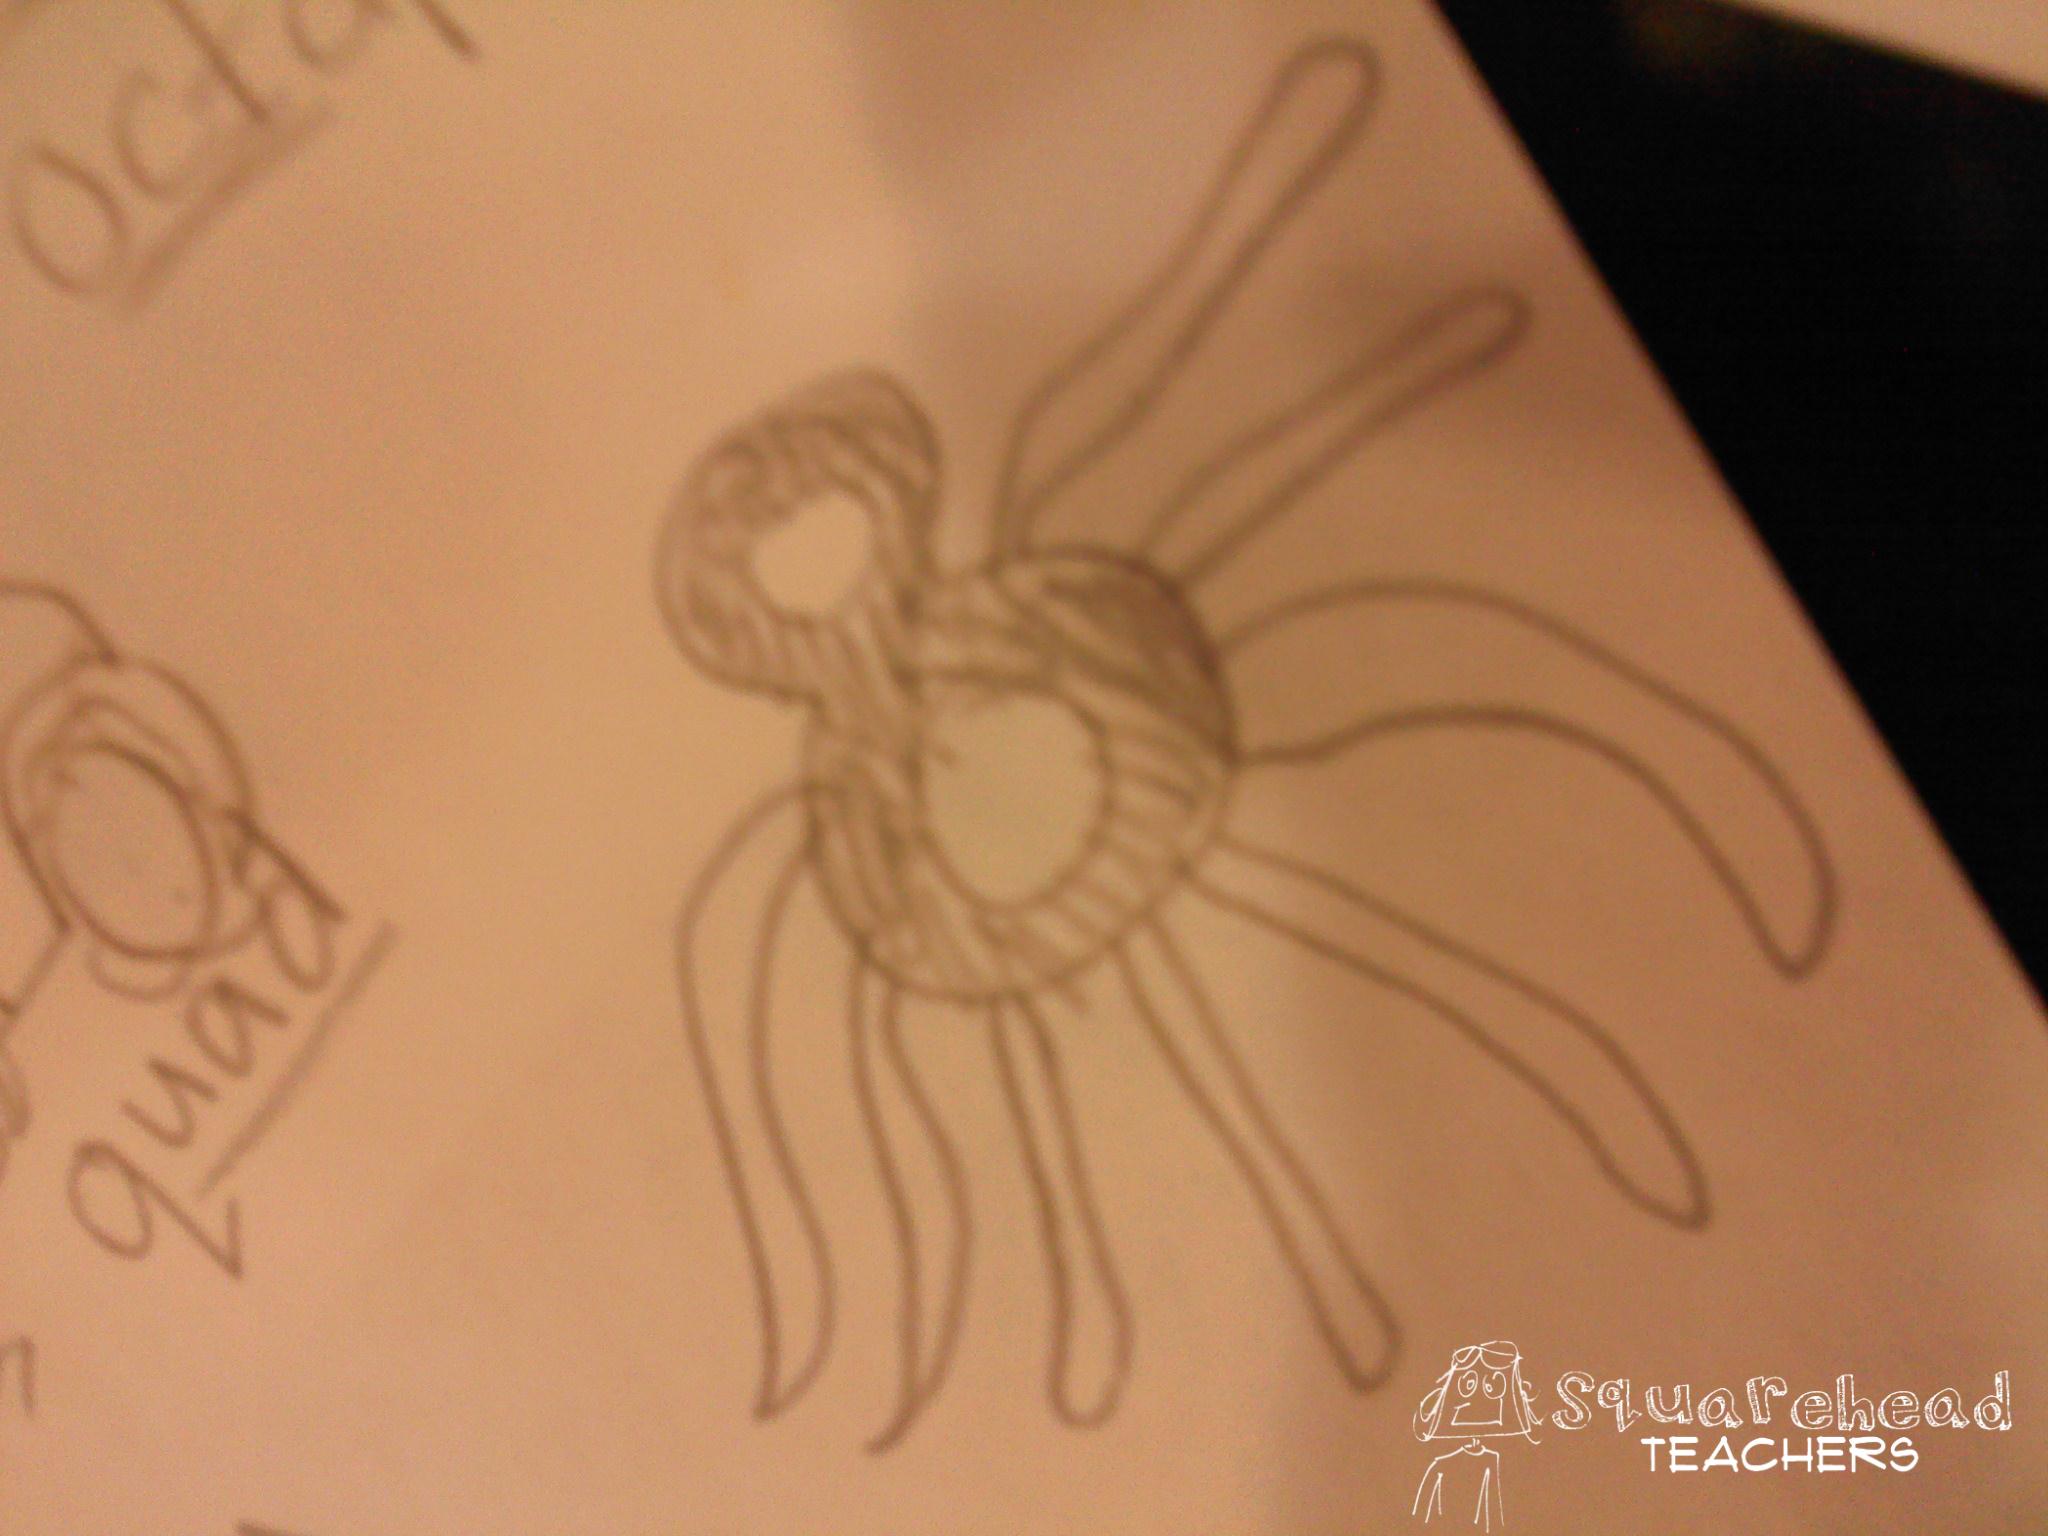 2048x1536 Octopus Squarehead Teachers